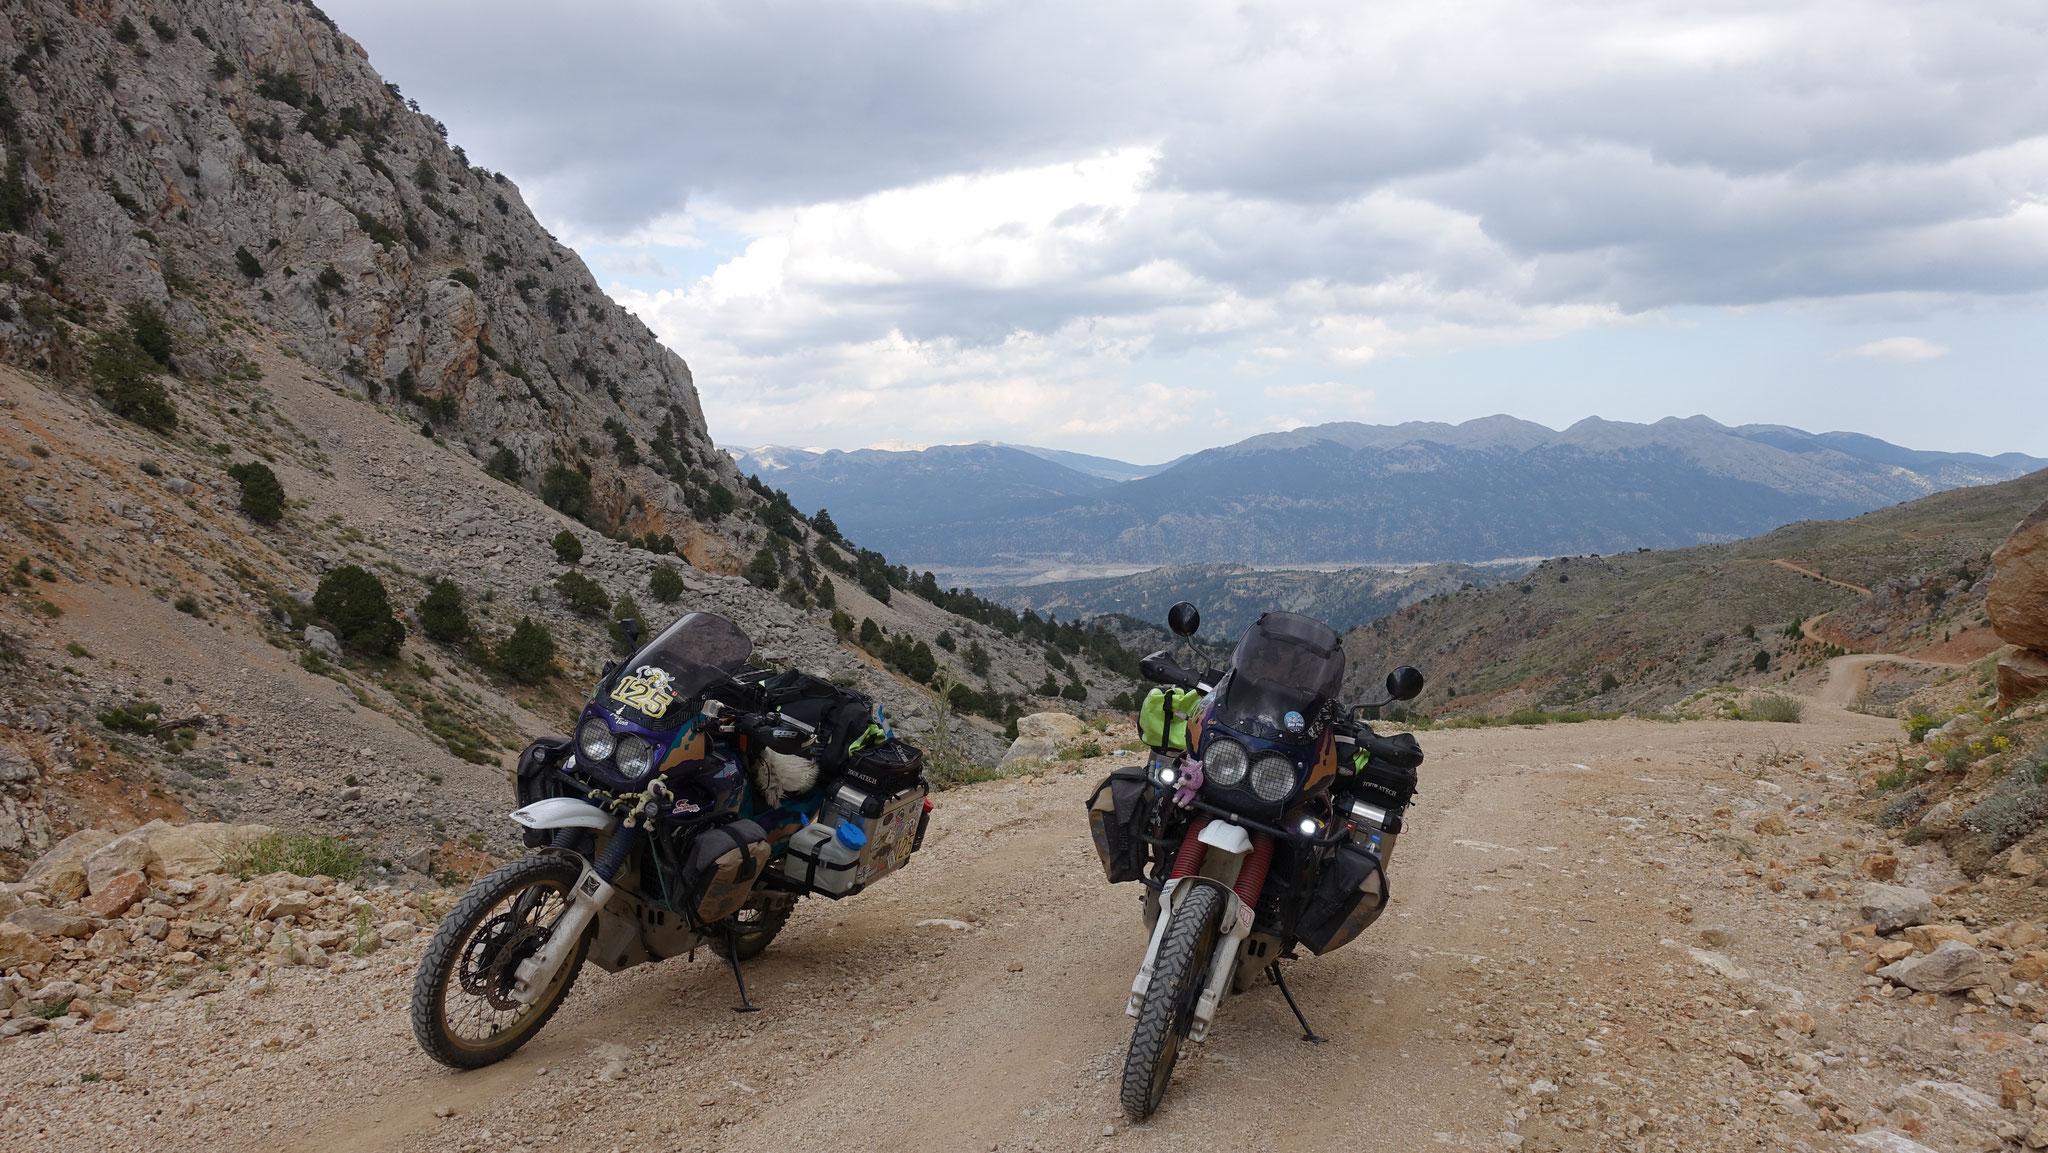 Auf dem Weg in die Berge...